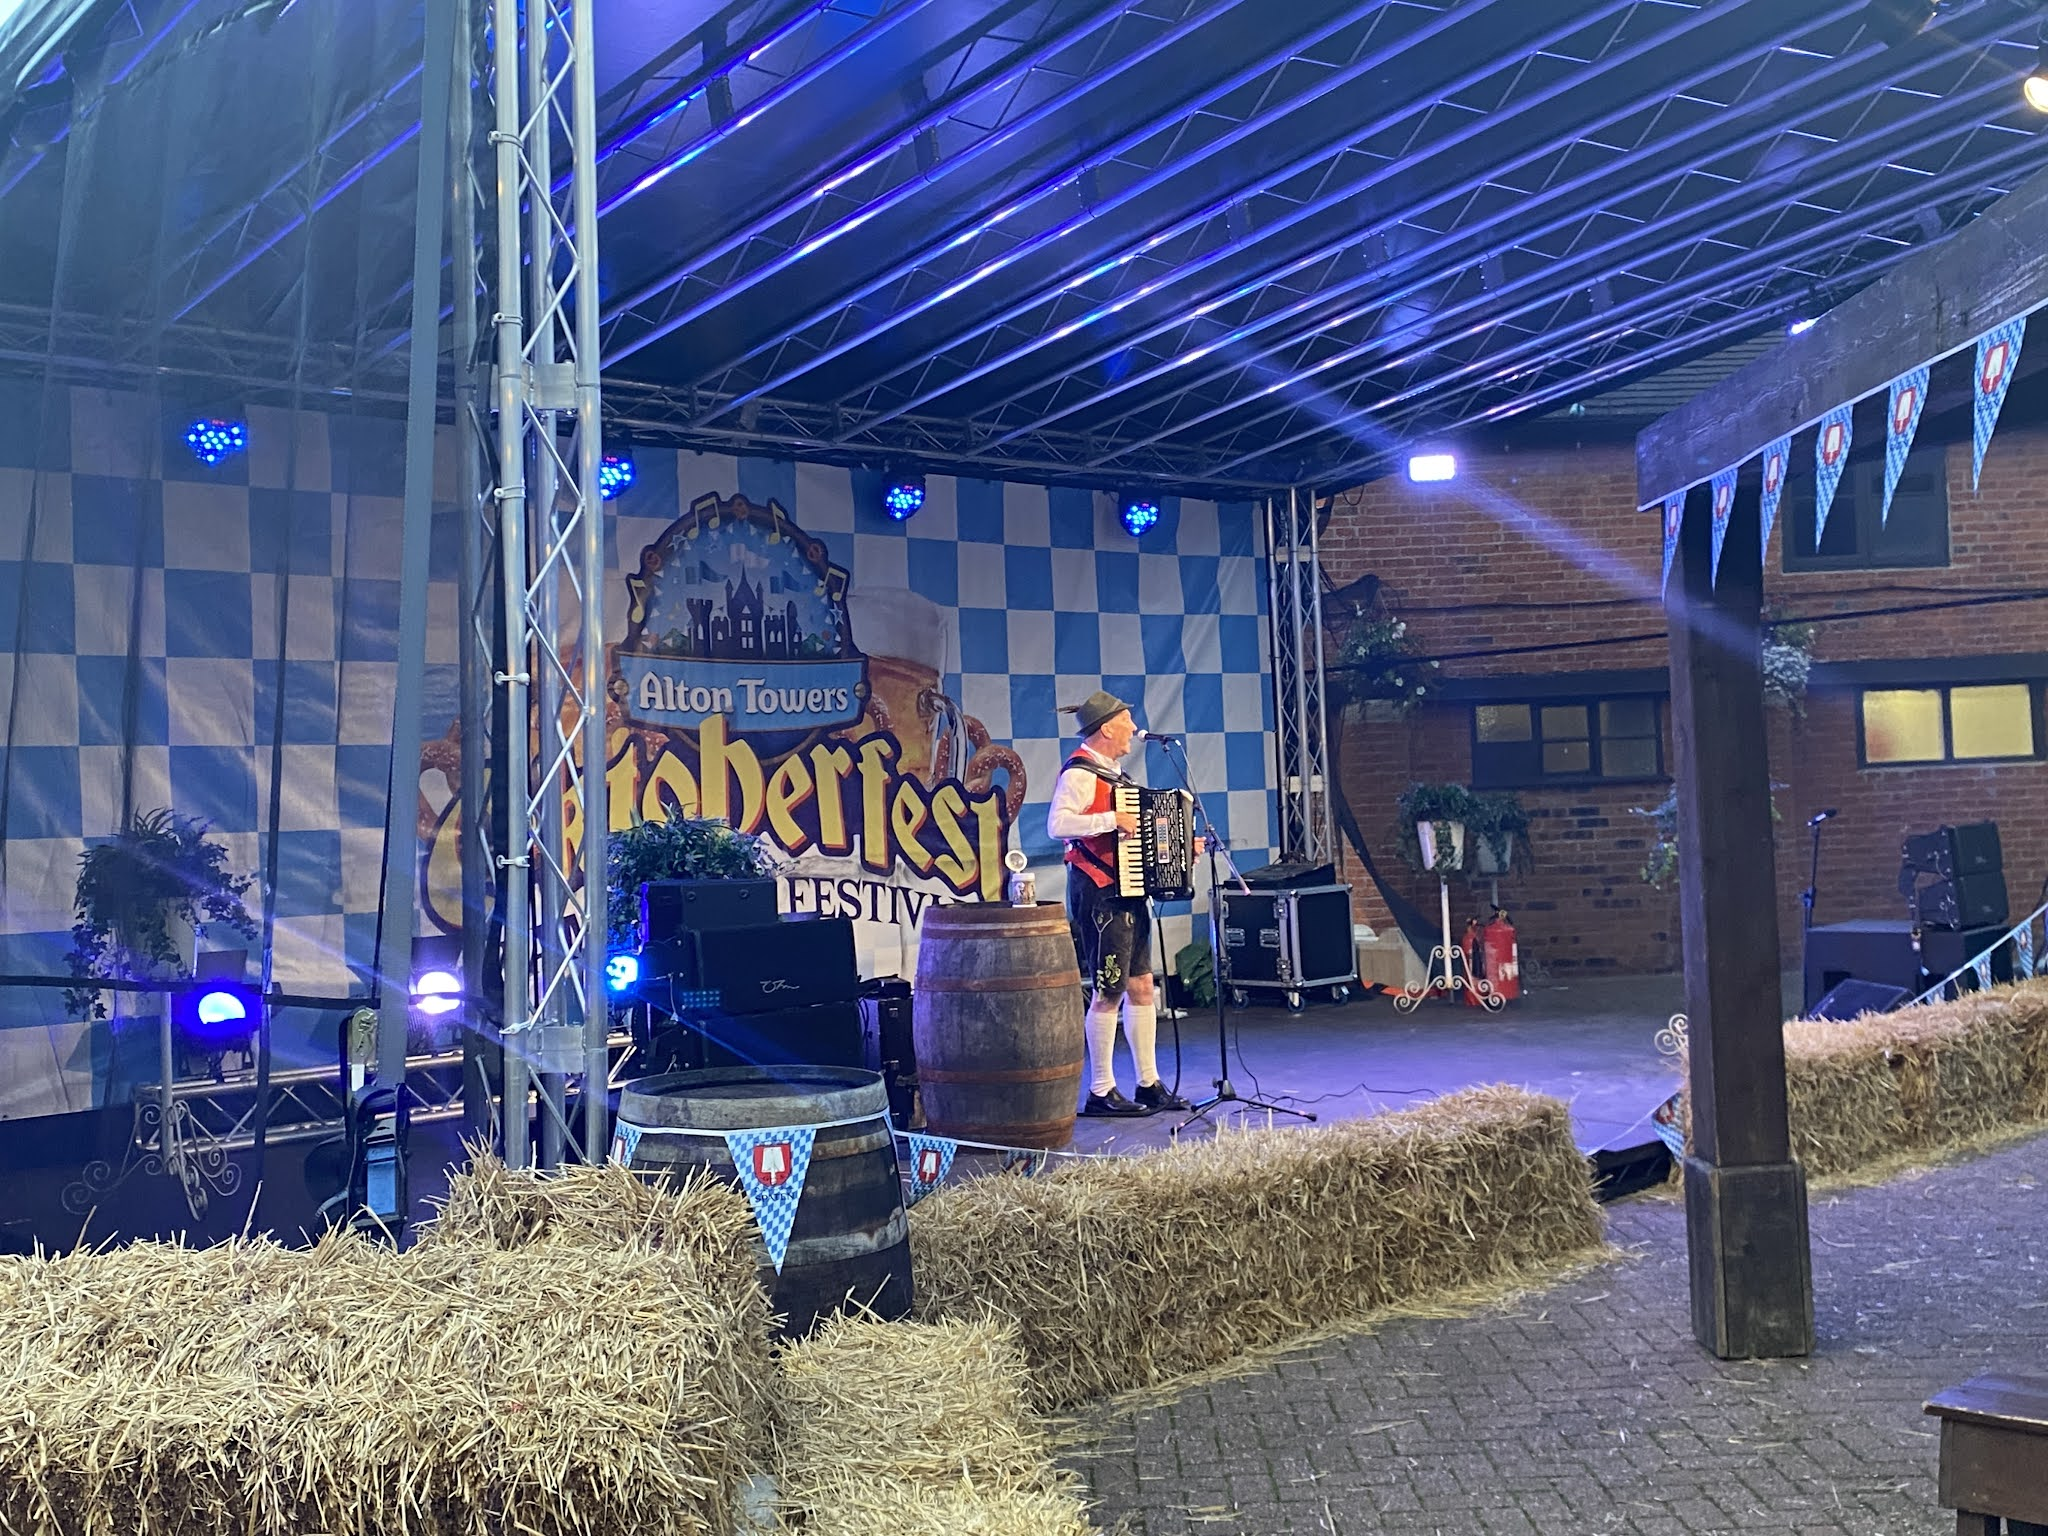 Oktoberfest stage at Alton Towers